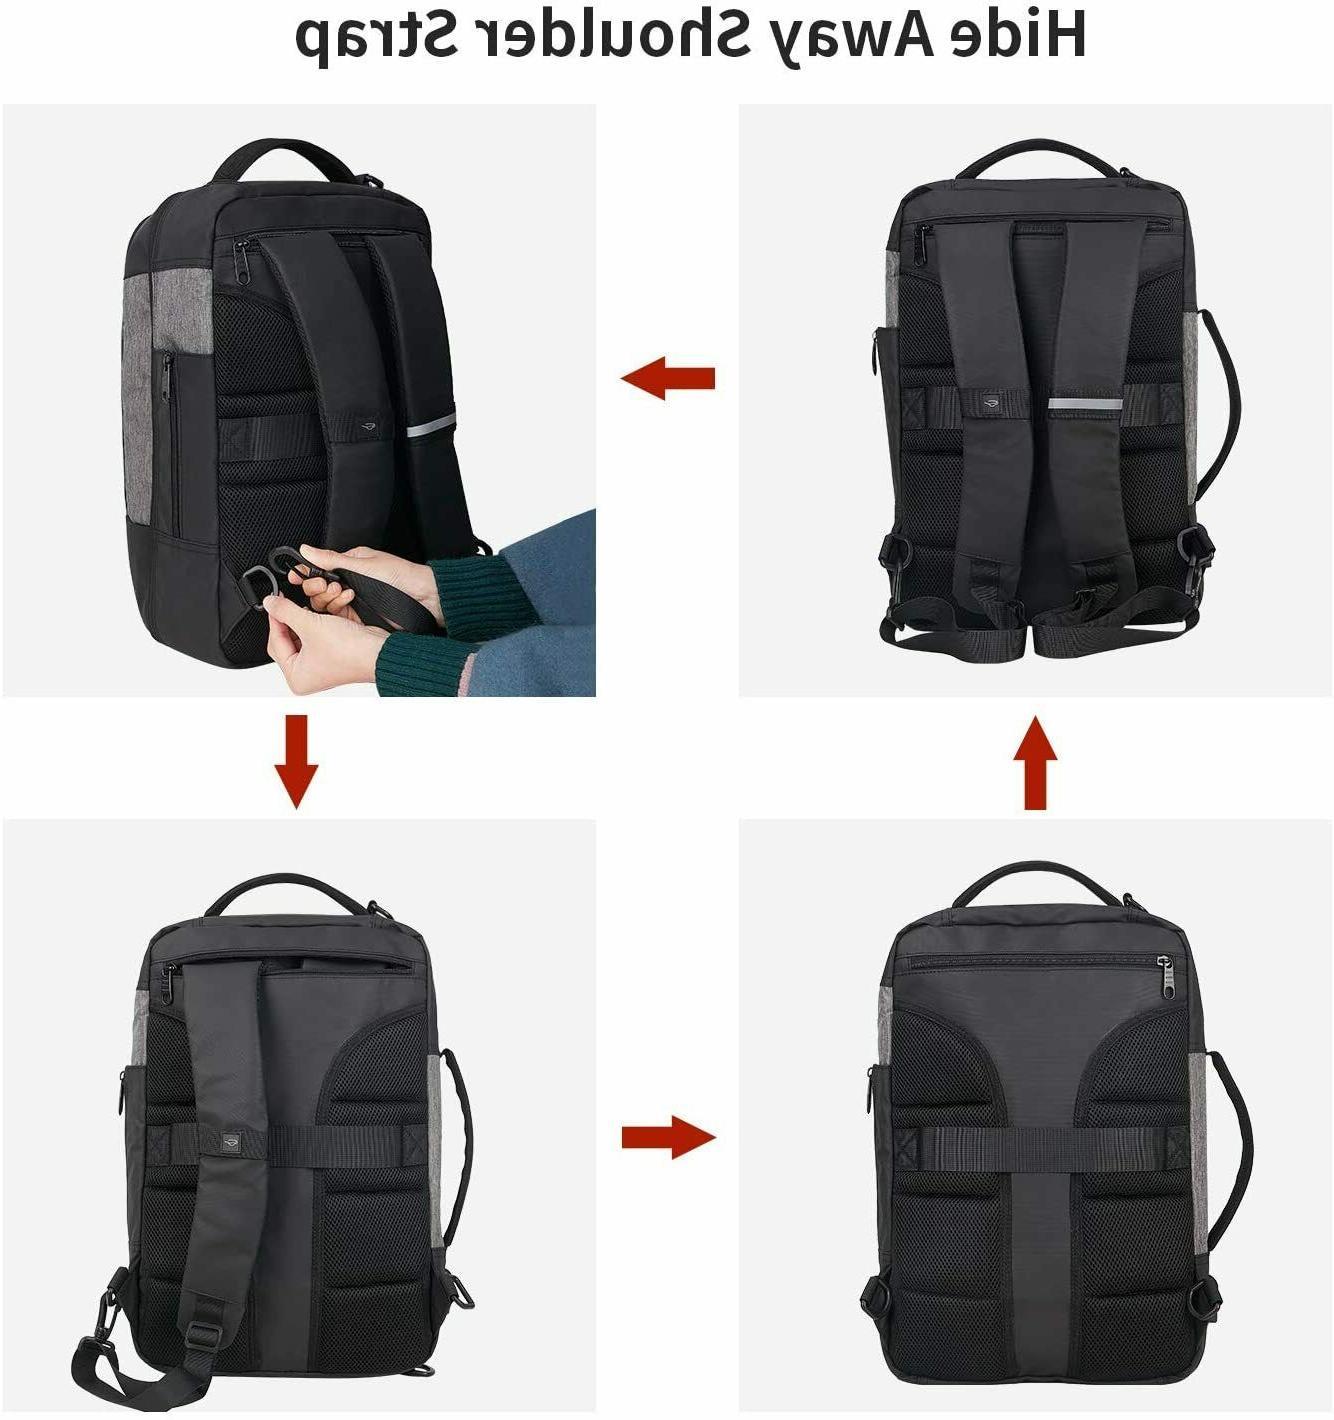 Laptop Backpack for Women Men,Travel Backpack Inch with usb port